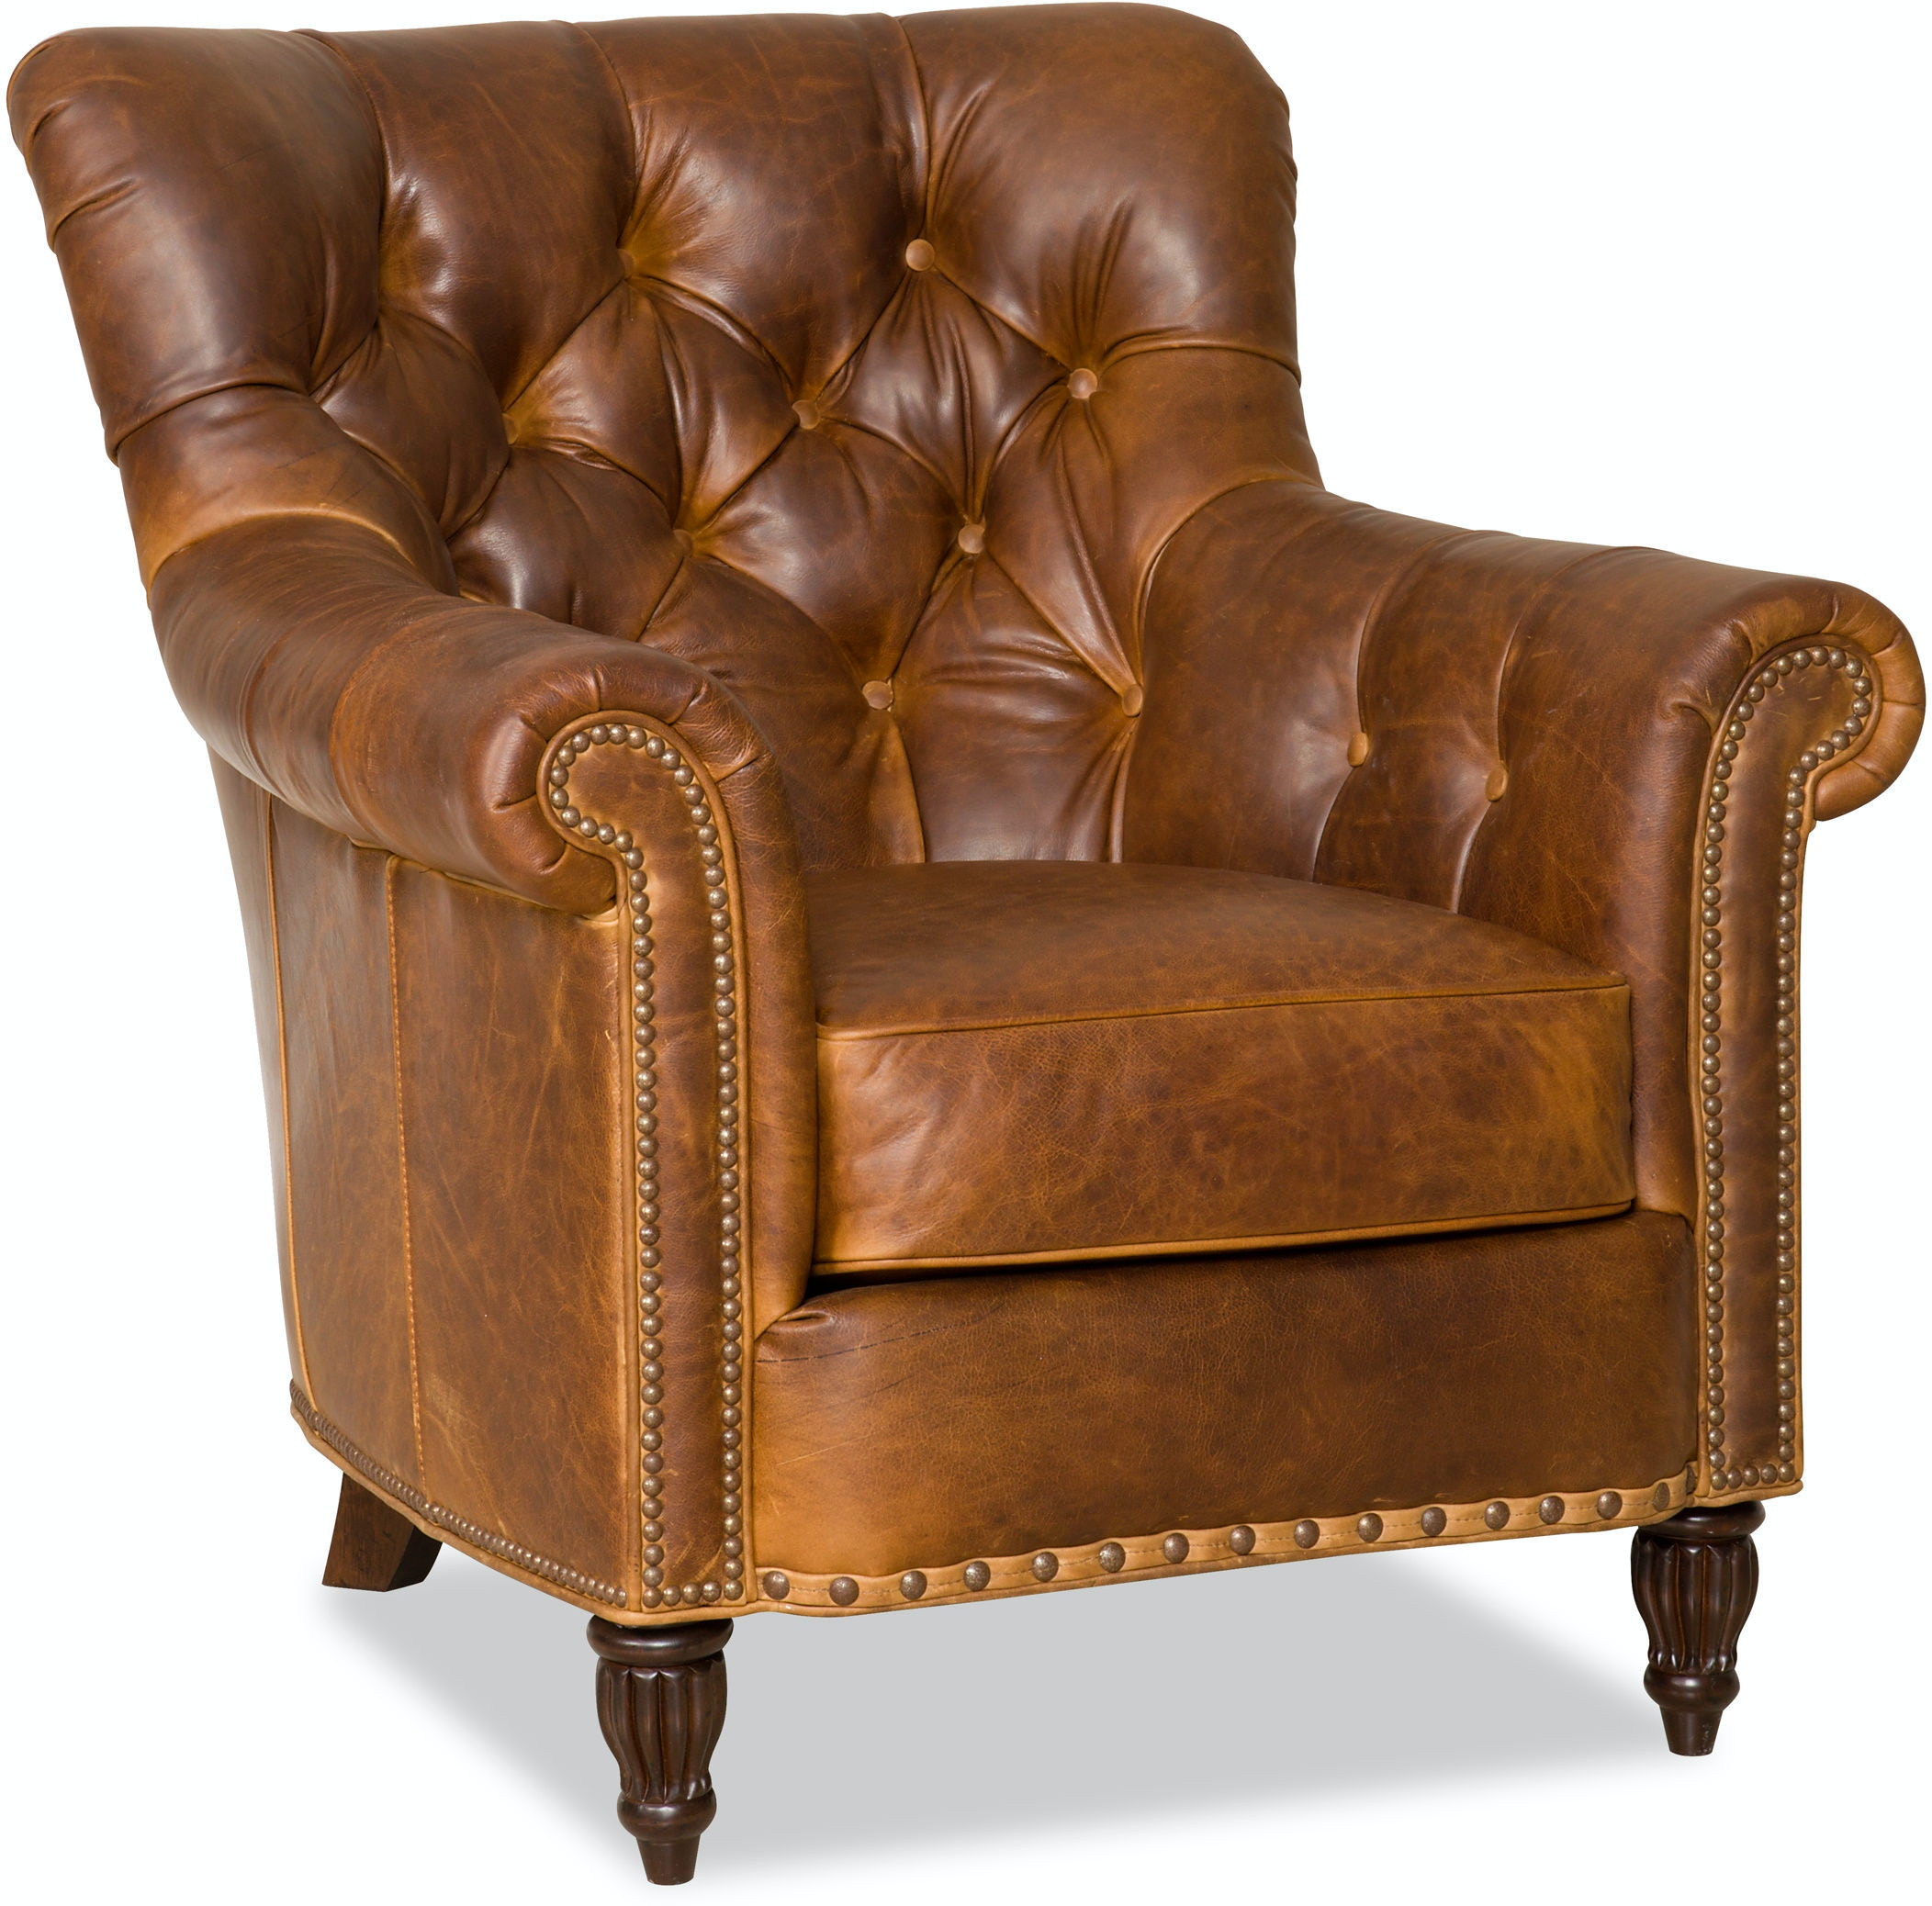 Bradington-Young Kirby Stationary Chair 463-25